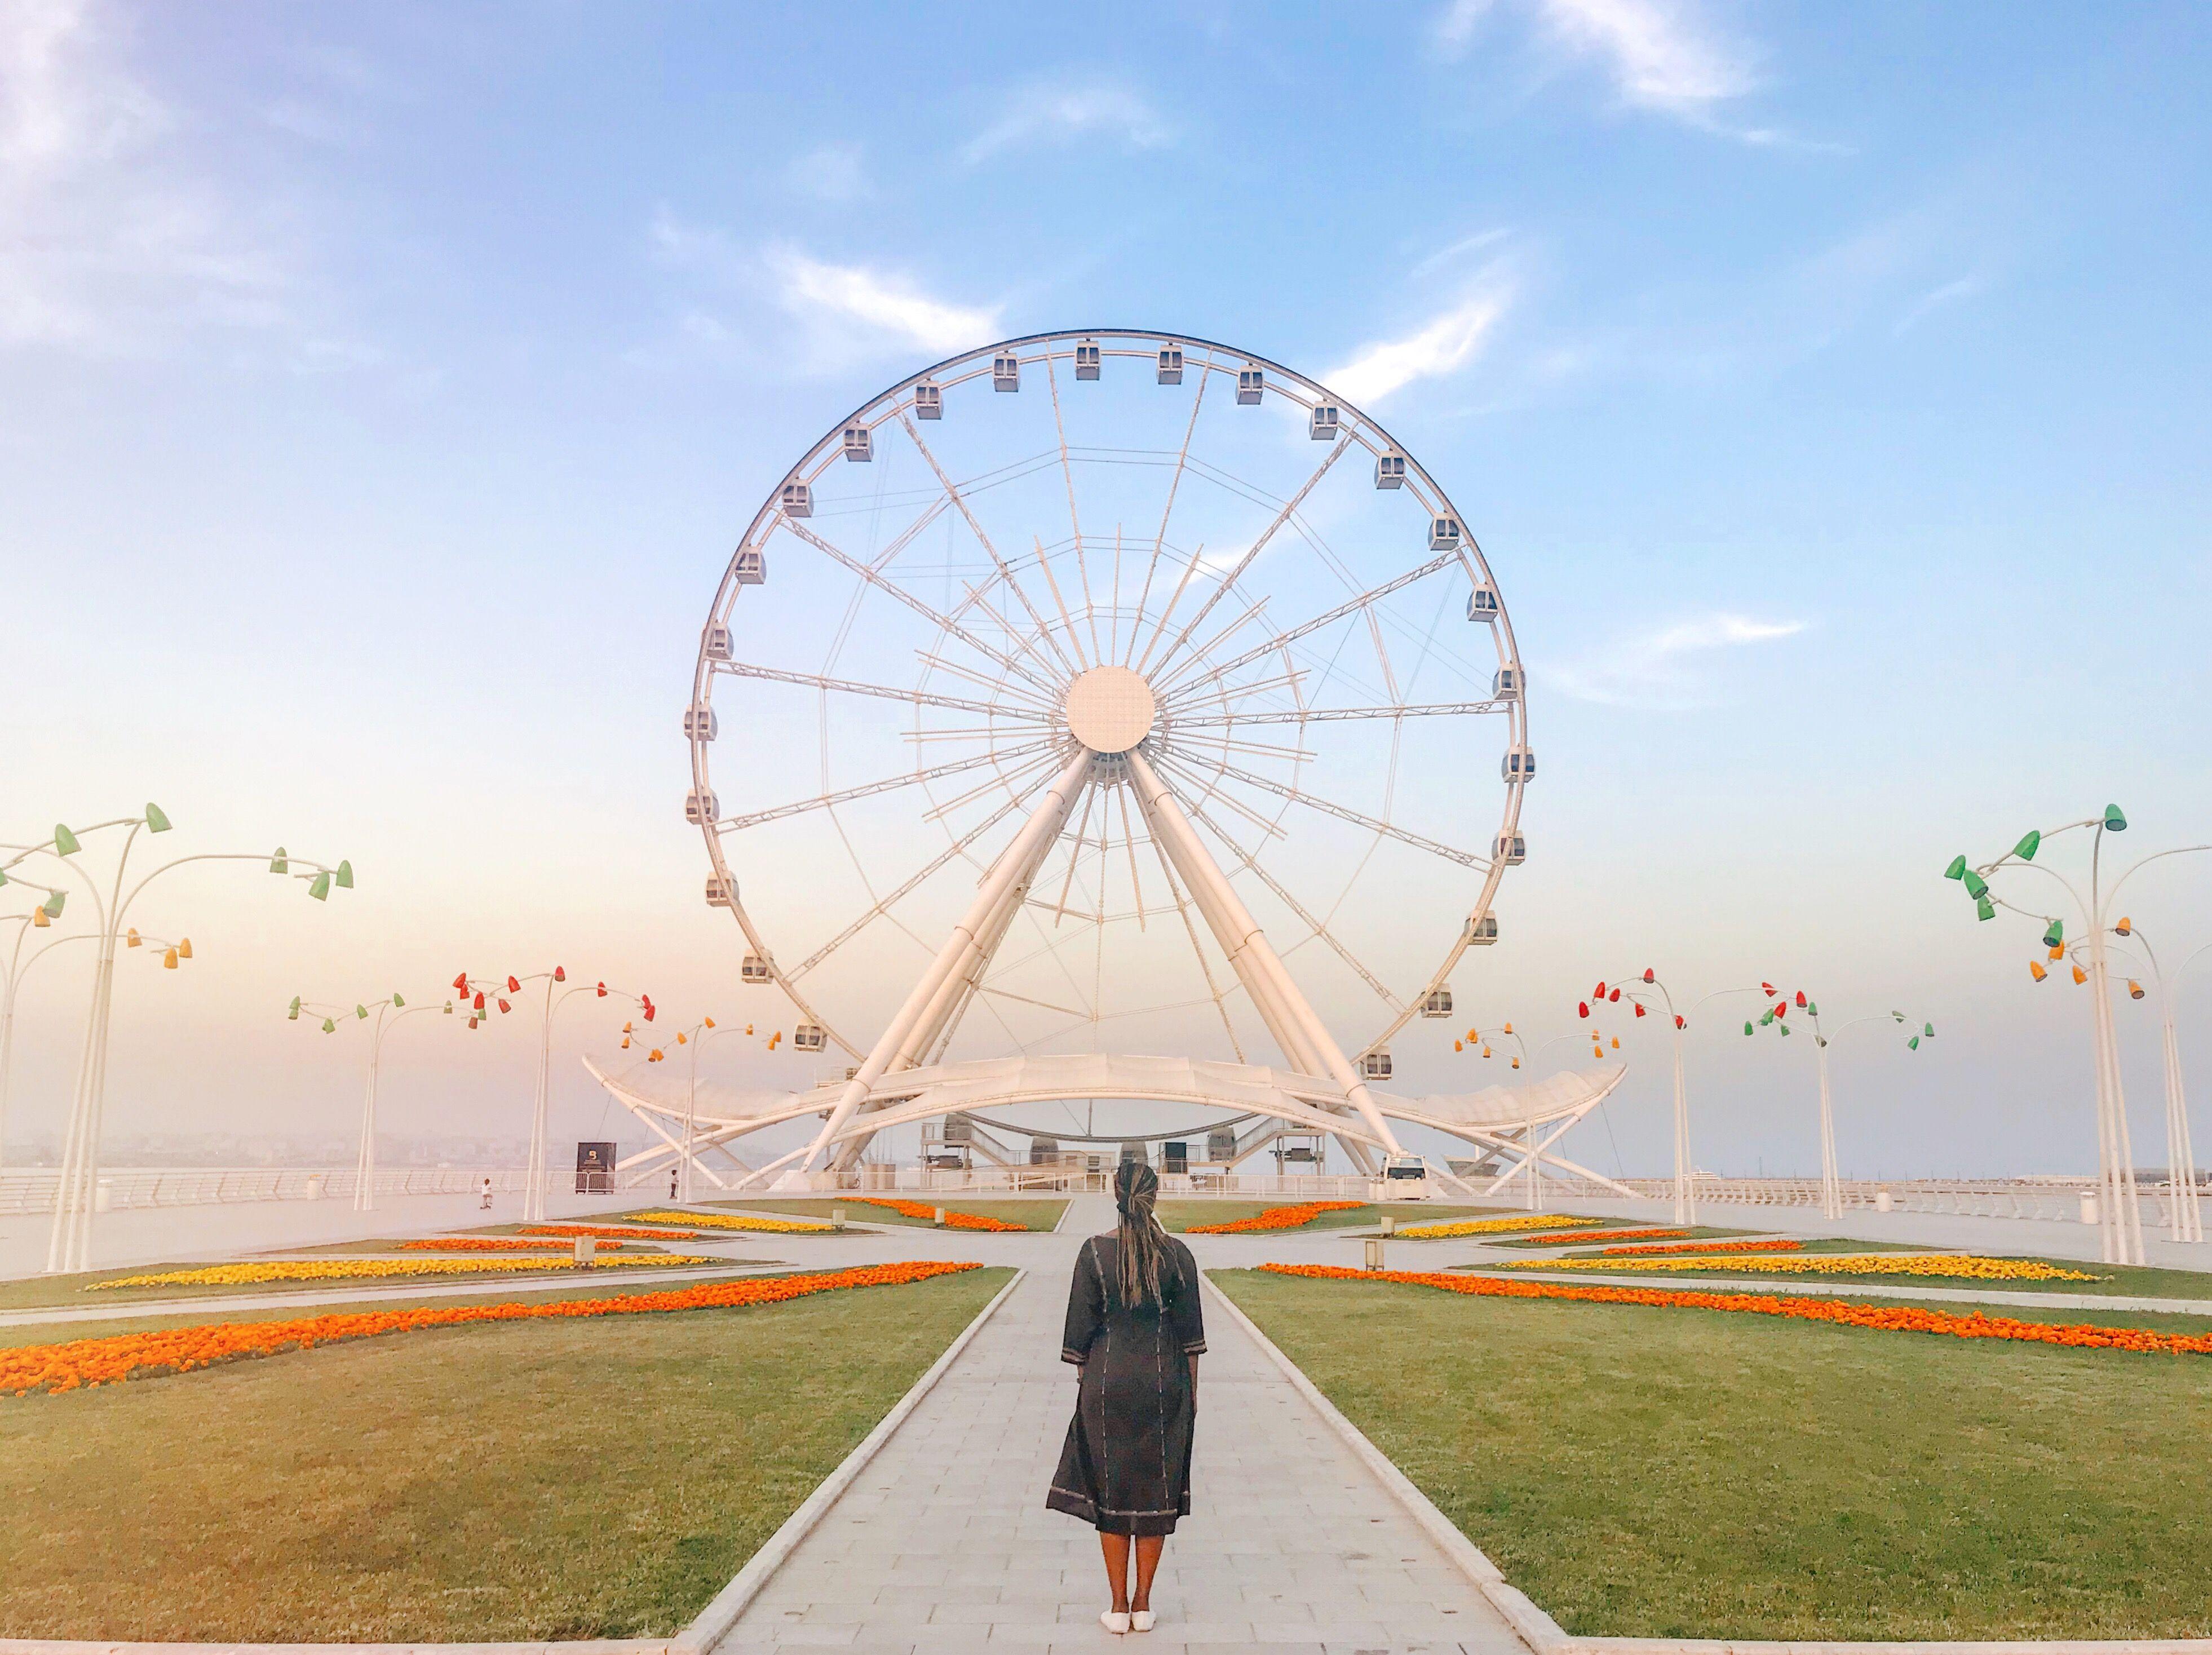 Baku Eye Azerbaijan Fair Grounds Asia Grounds